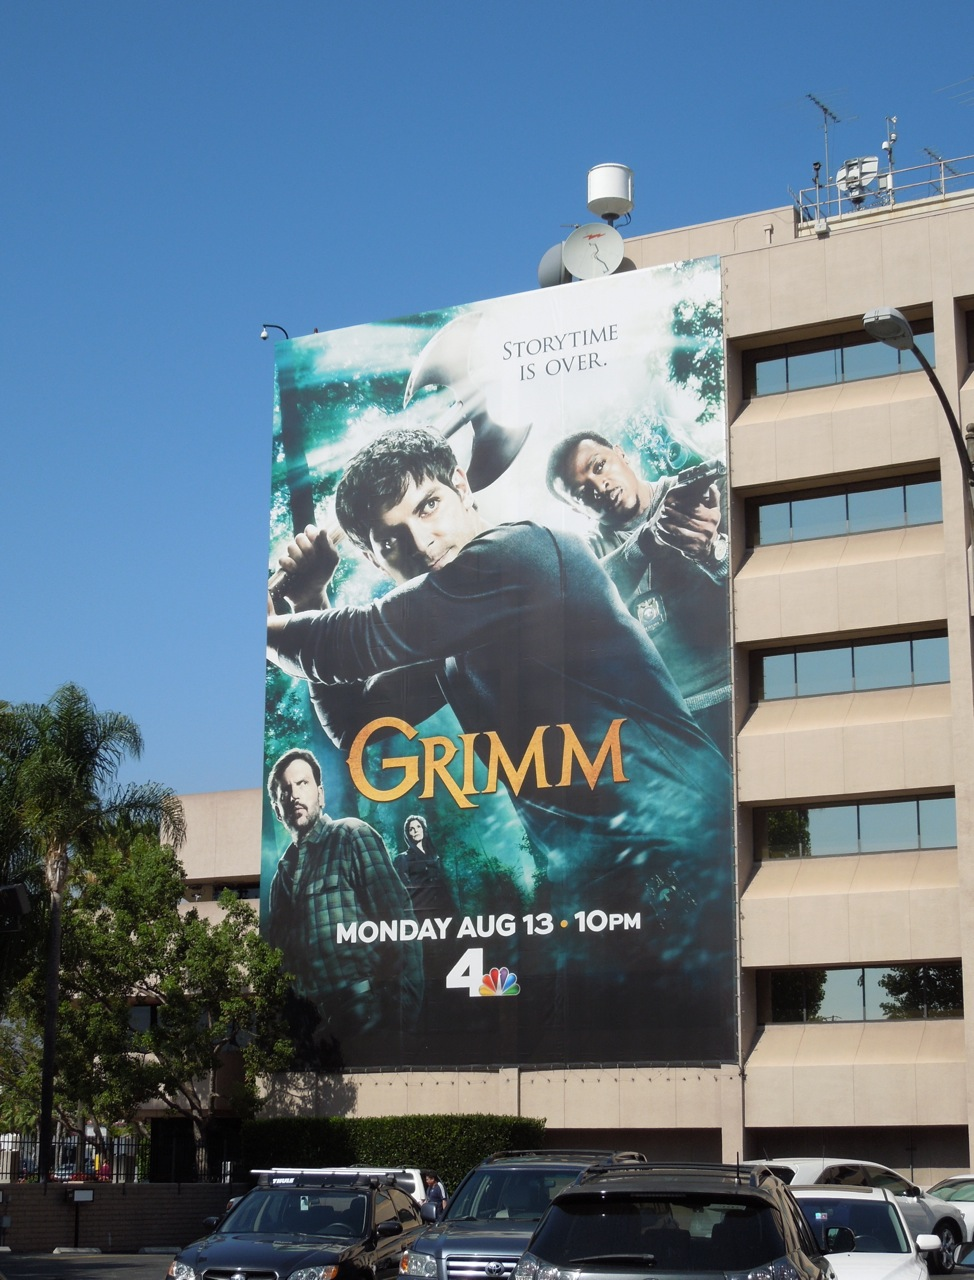 http://2.bp.blogspot.com/-VgC6bAvF1Rc/UBiLe6BlgBI/AAAAAAAAu7M/WR6enz0wosE/s1600/Grimm+season2+NBC+billboard.jpg